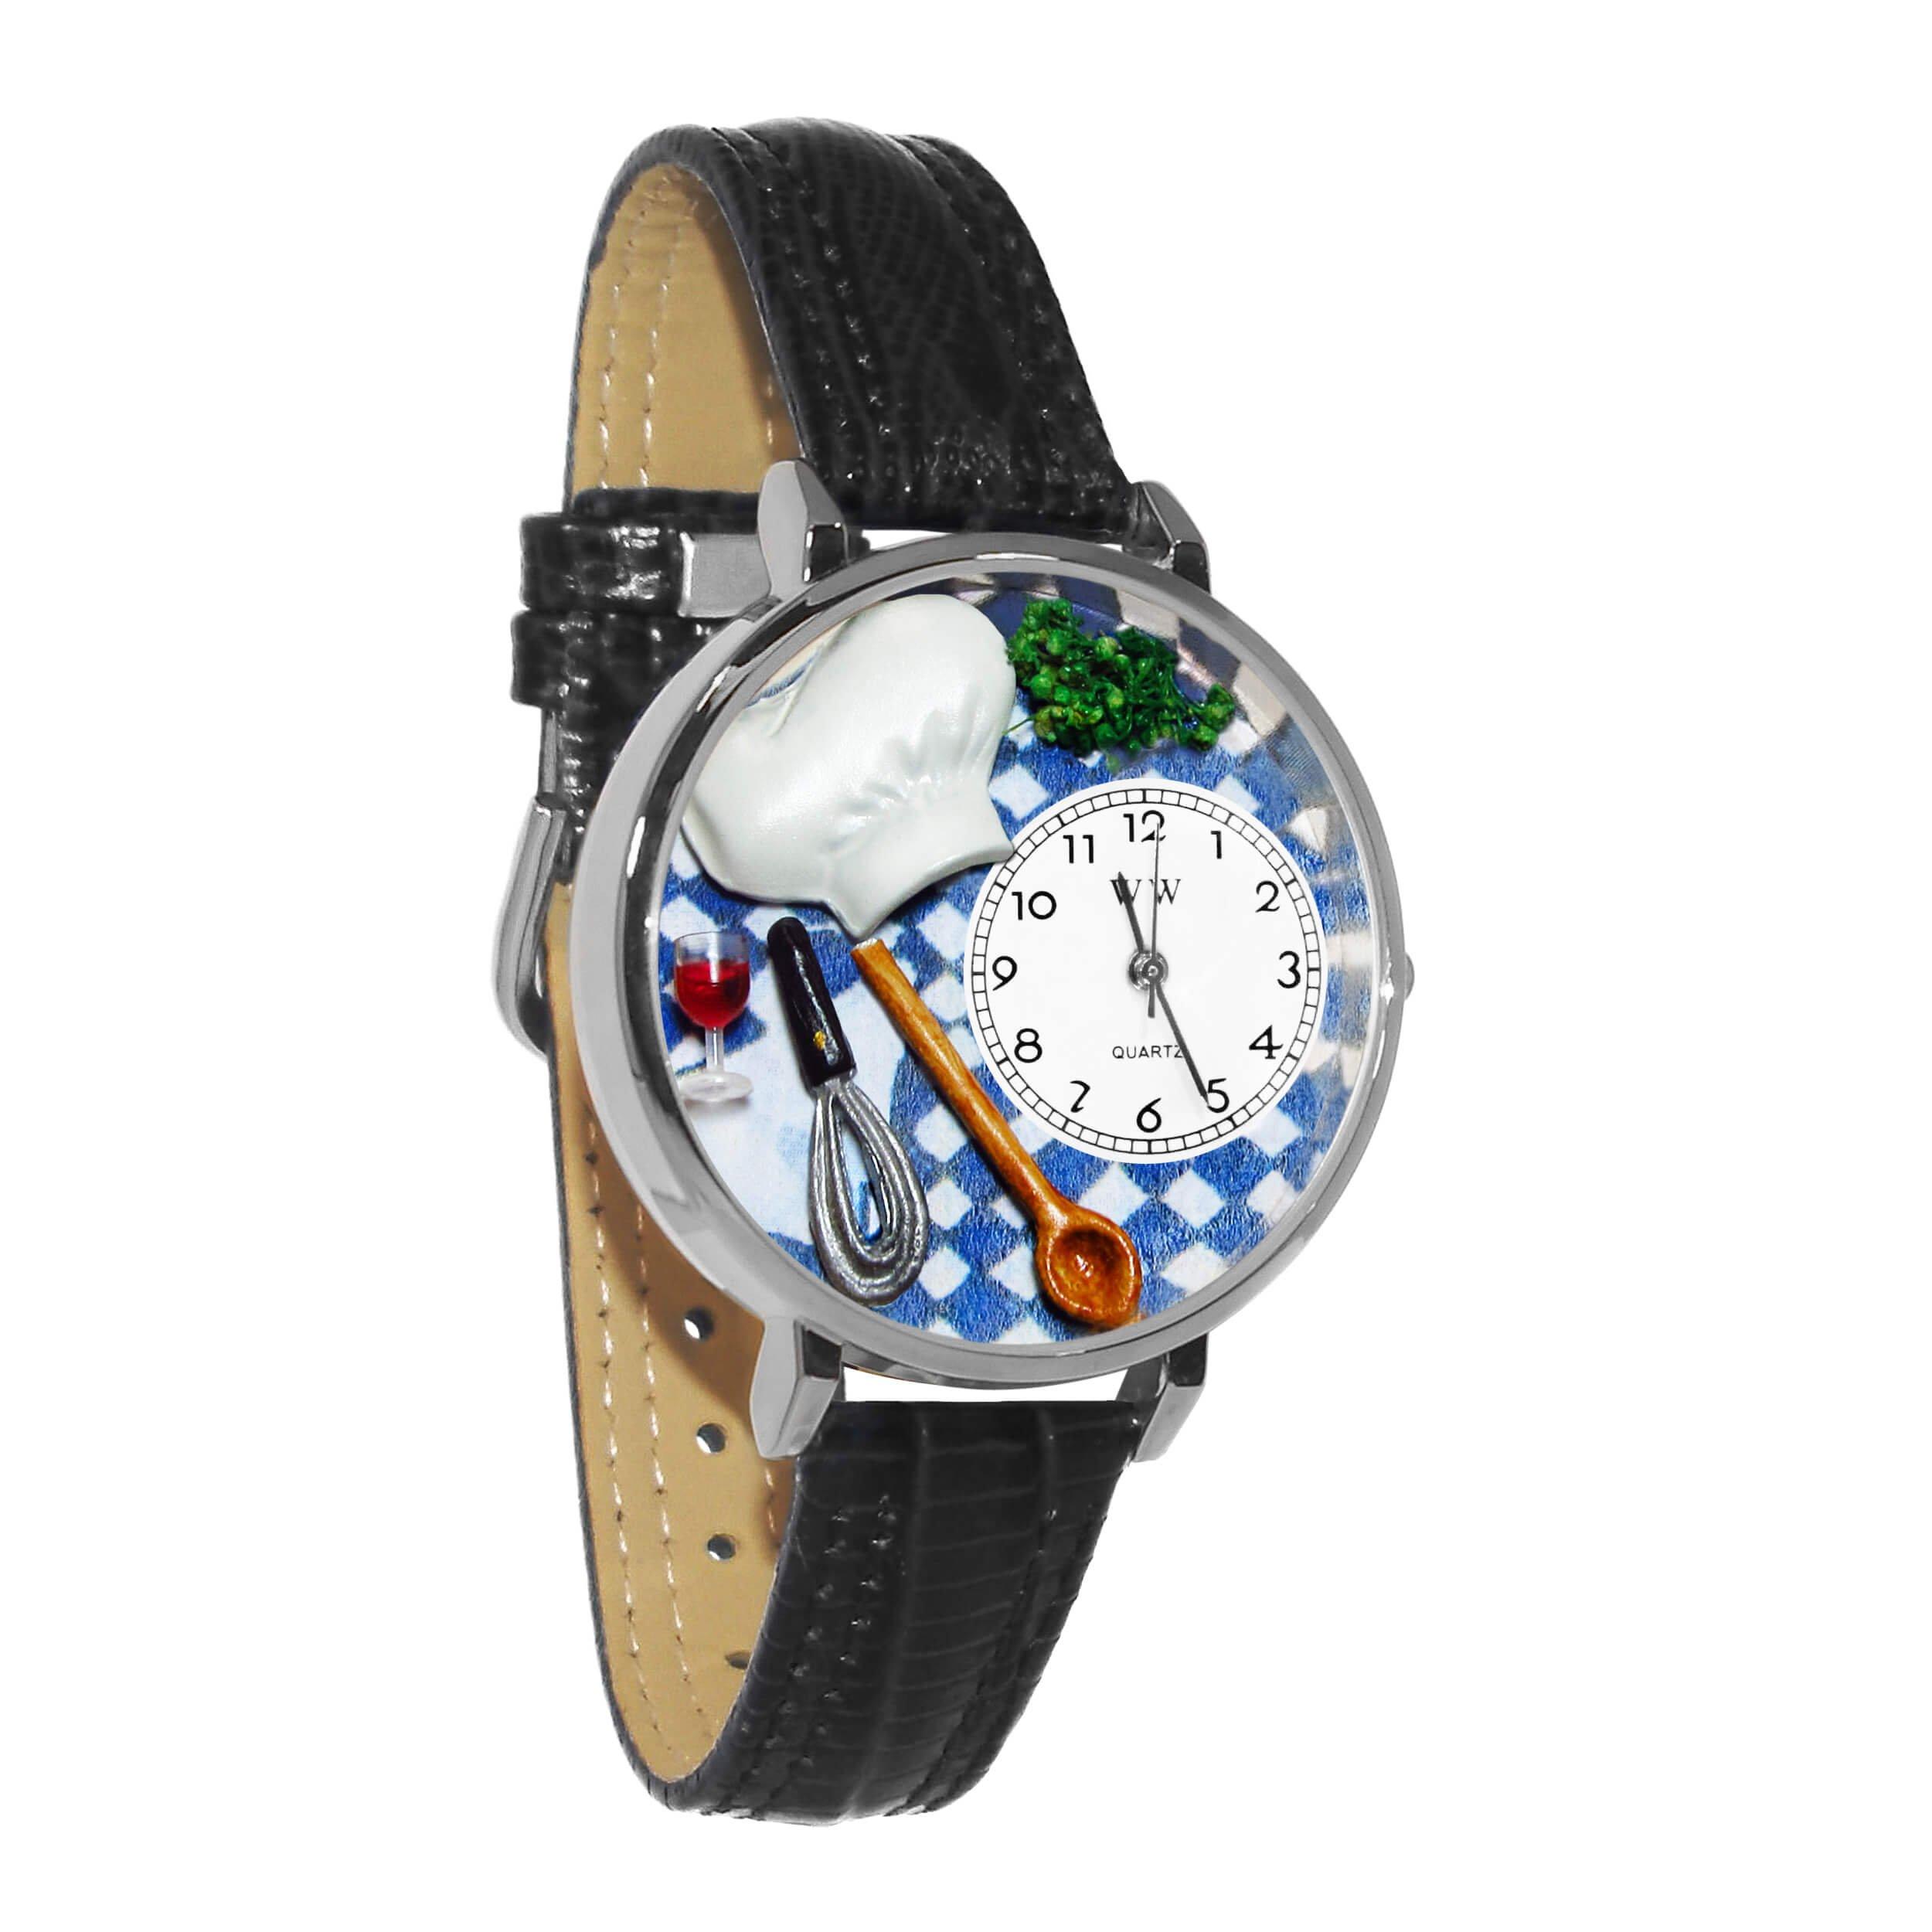 Whimsical Watches Unisex U0310002 Chef Black Skin Leather Watch